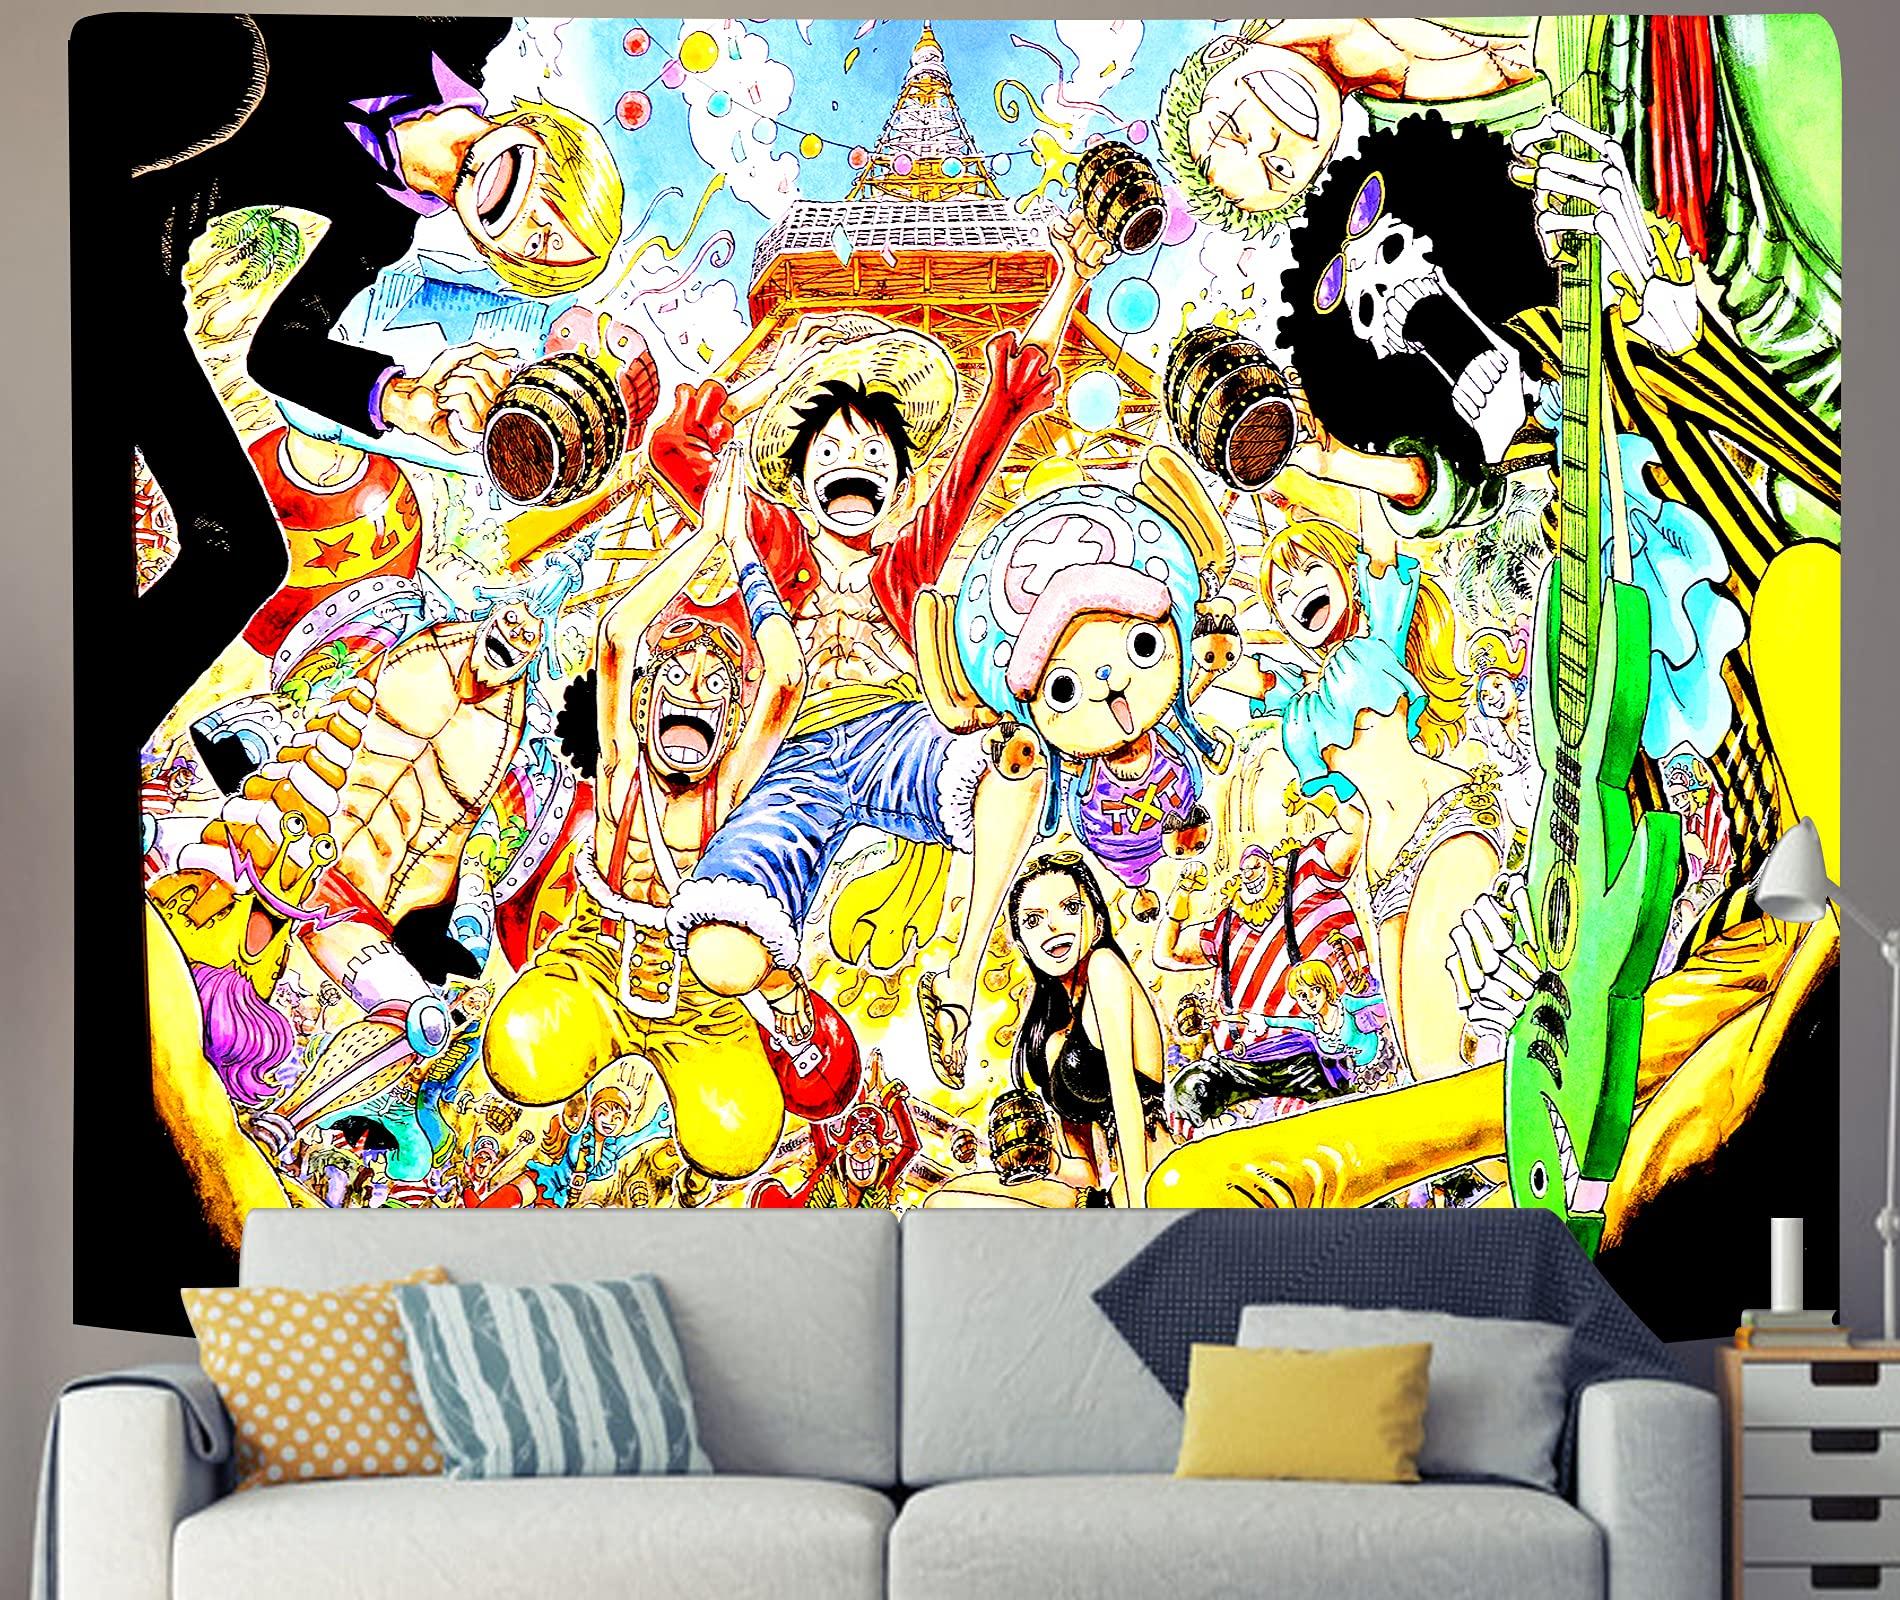 SKFFER One Piece Tapestry 3 Piece Set One Piece Poster – One